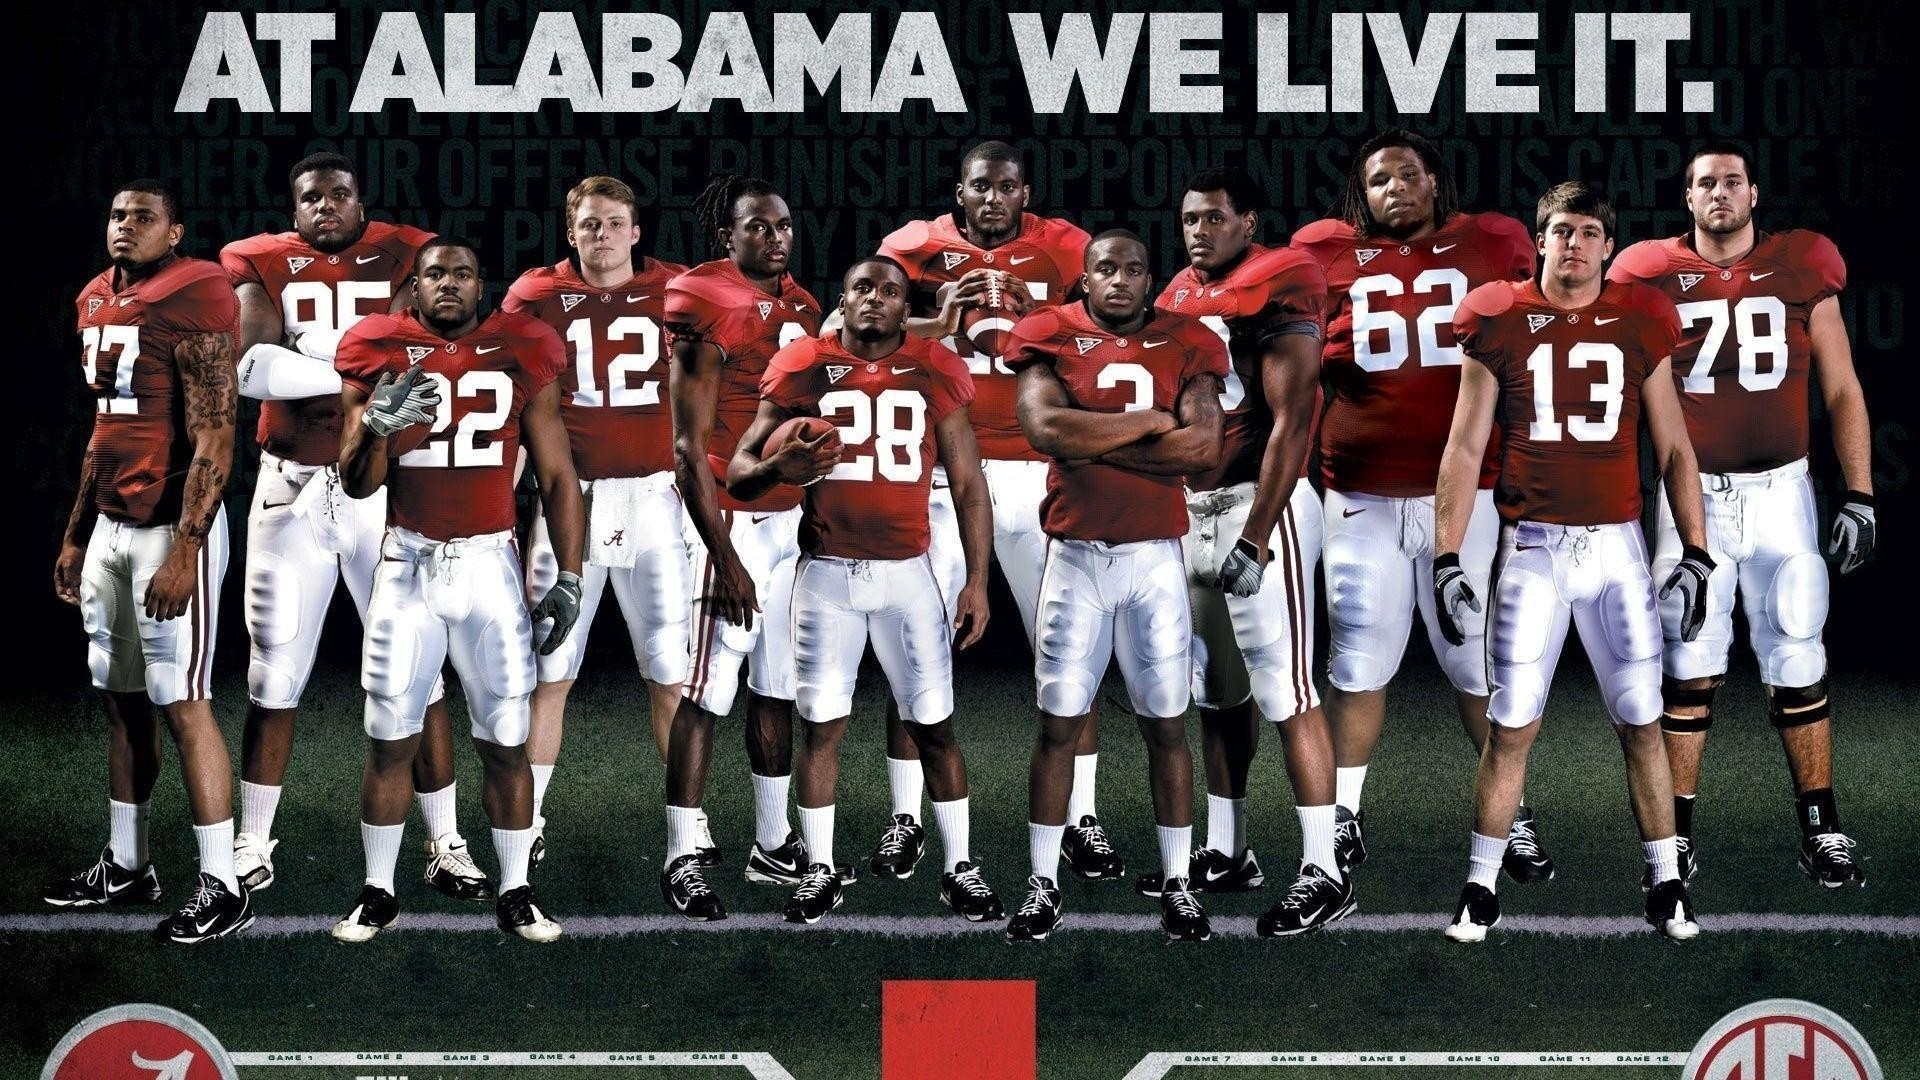 1920x1080 1920x1080 Football, College, Crimson Tide, Alabama Football Team .